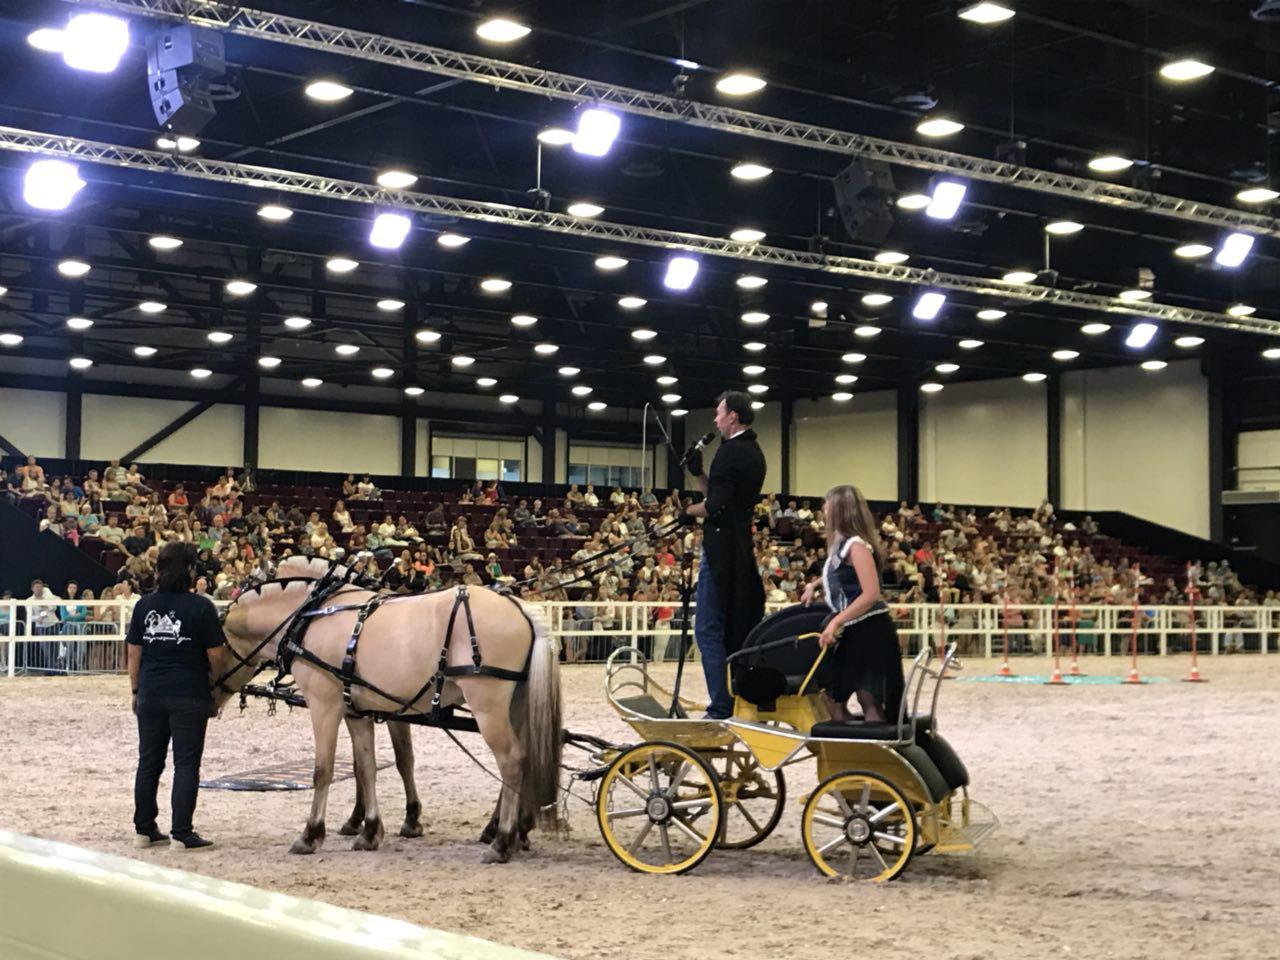 Horse-driving.ru - О езде в упряжи - Главная 4rnsN1emVa4